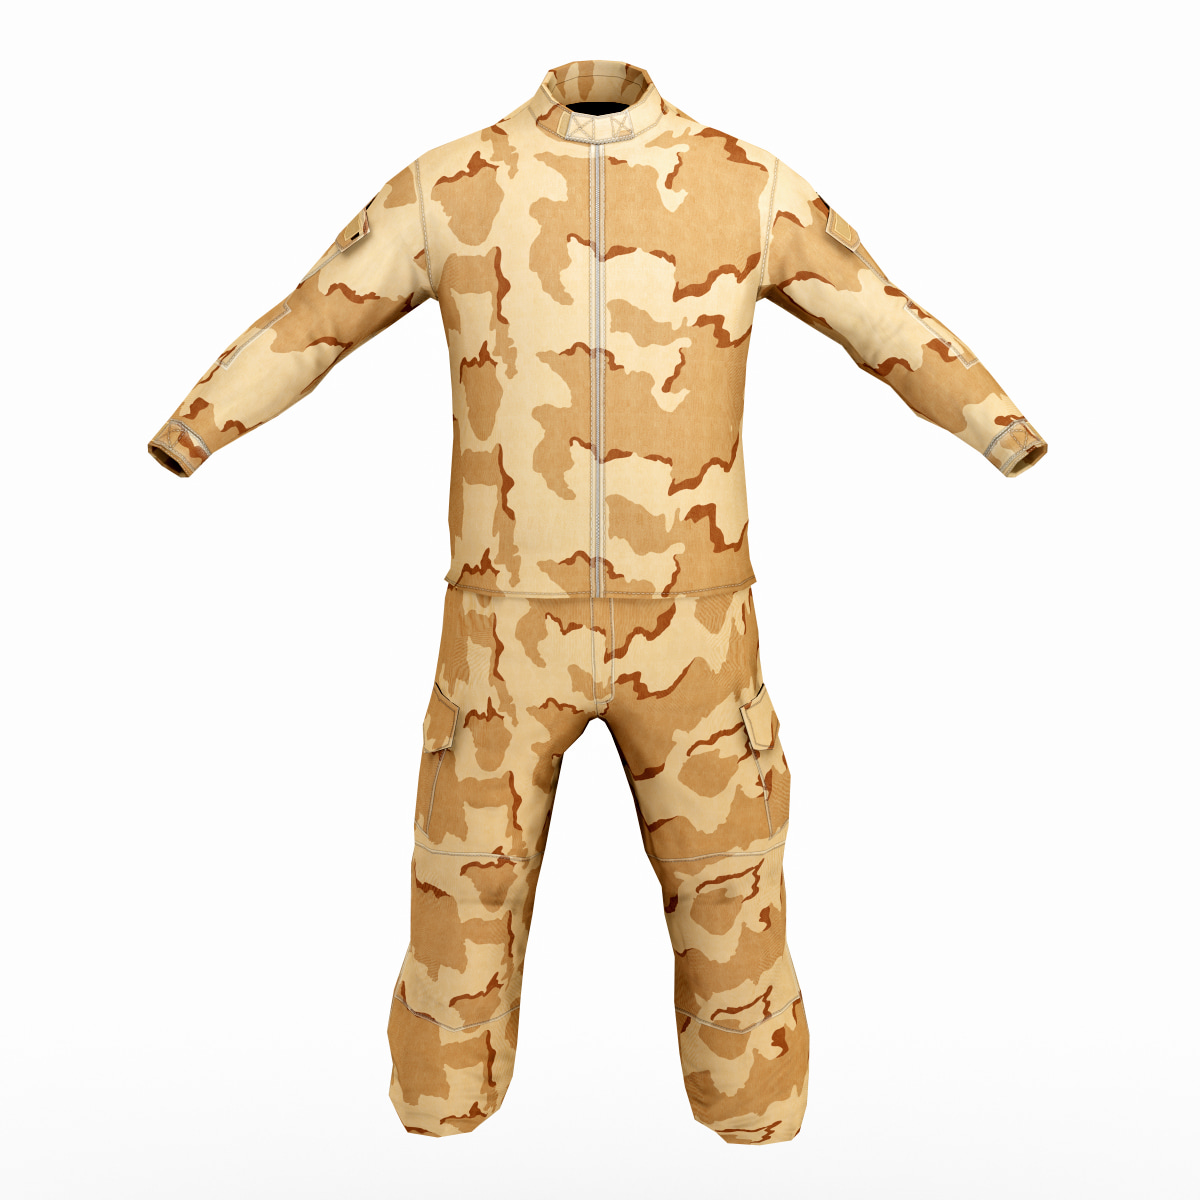 SAS_Soldier_Clothes_V5_000.jpg